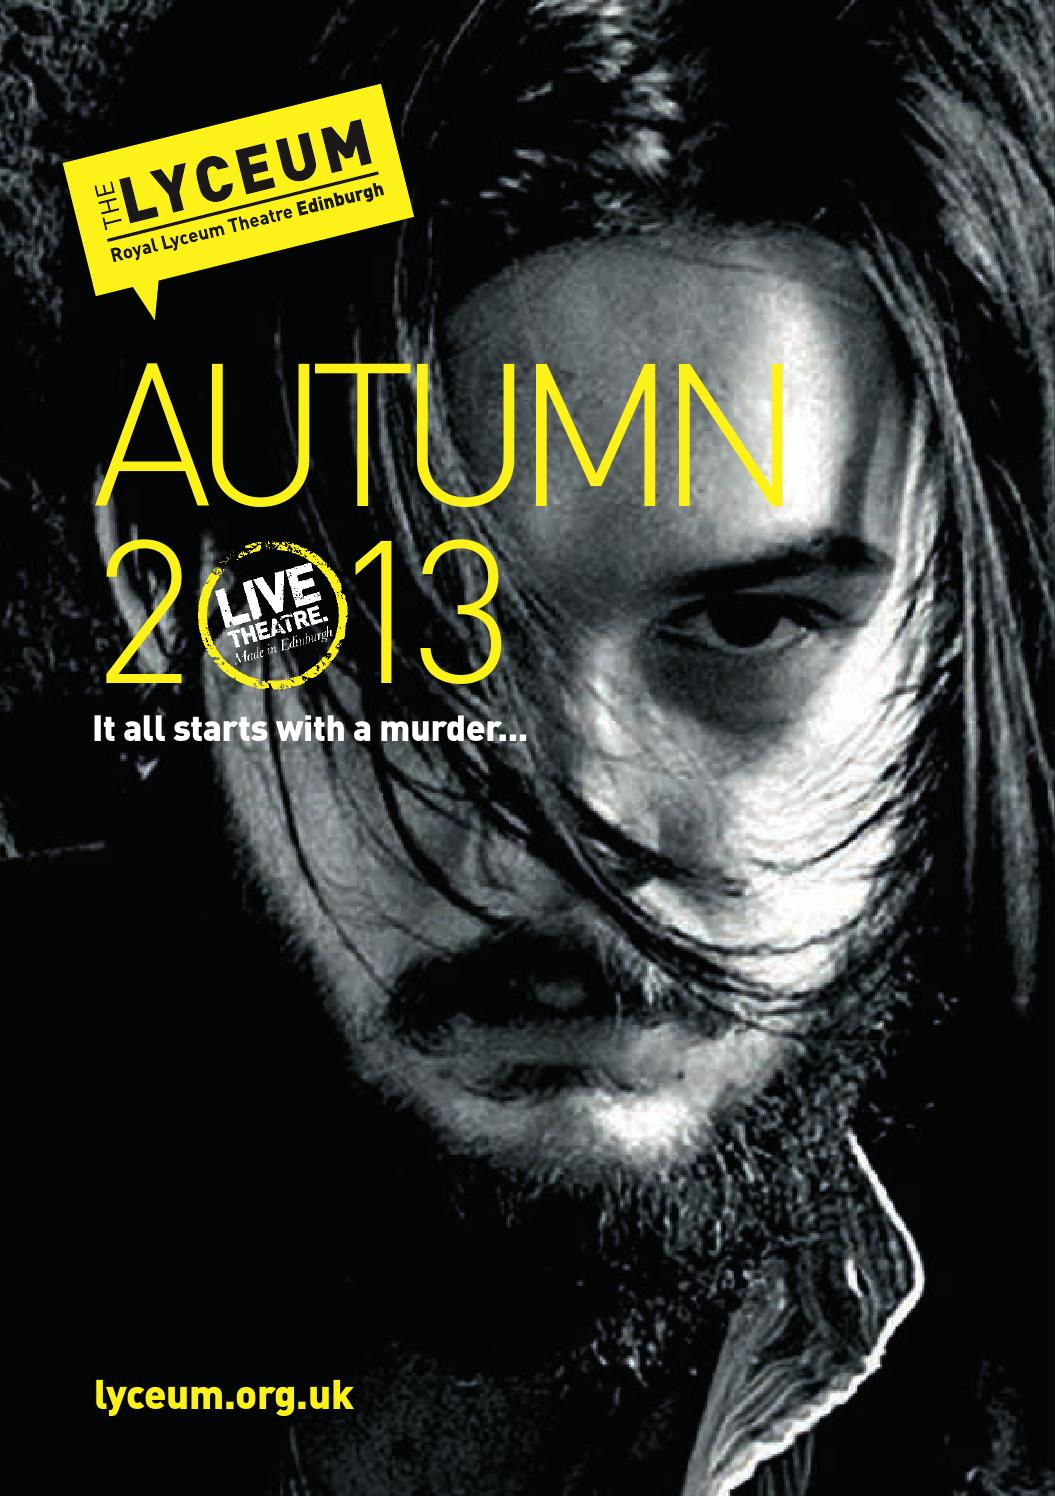 Royal Lyceum Theatre Edinburgh | Autumn 2013 Brochure (Sept - Jan)